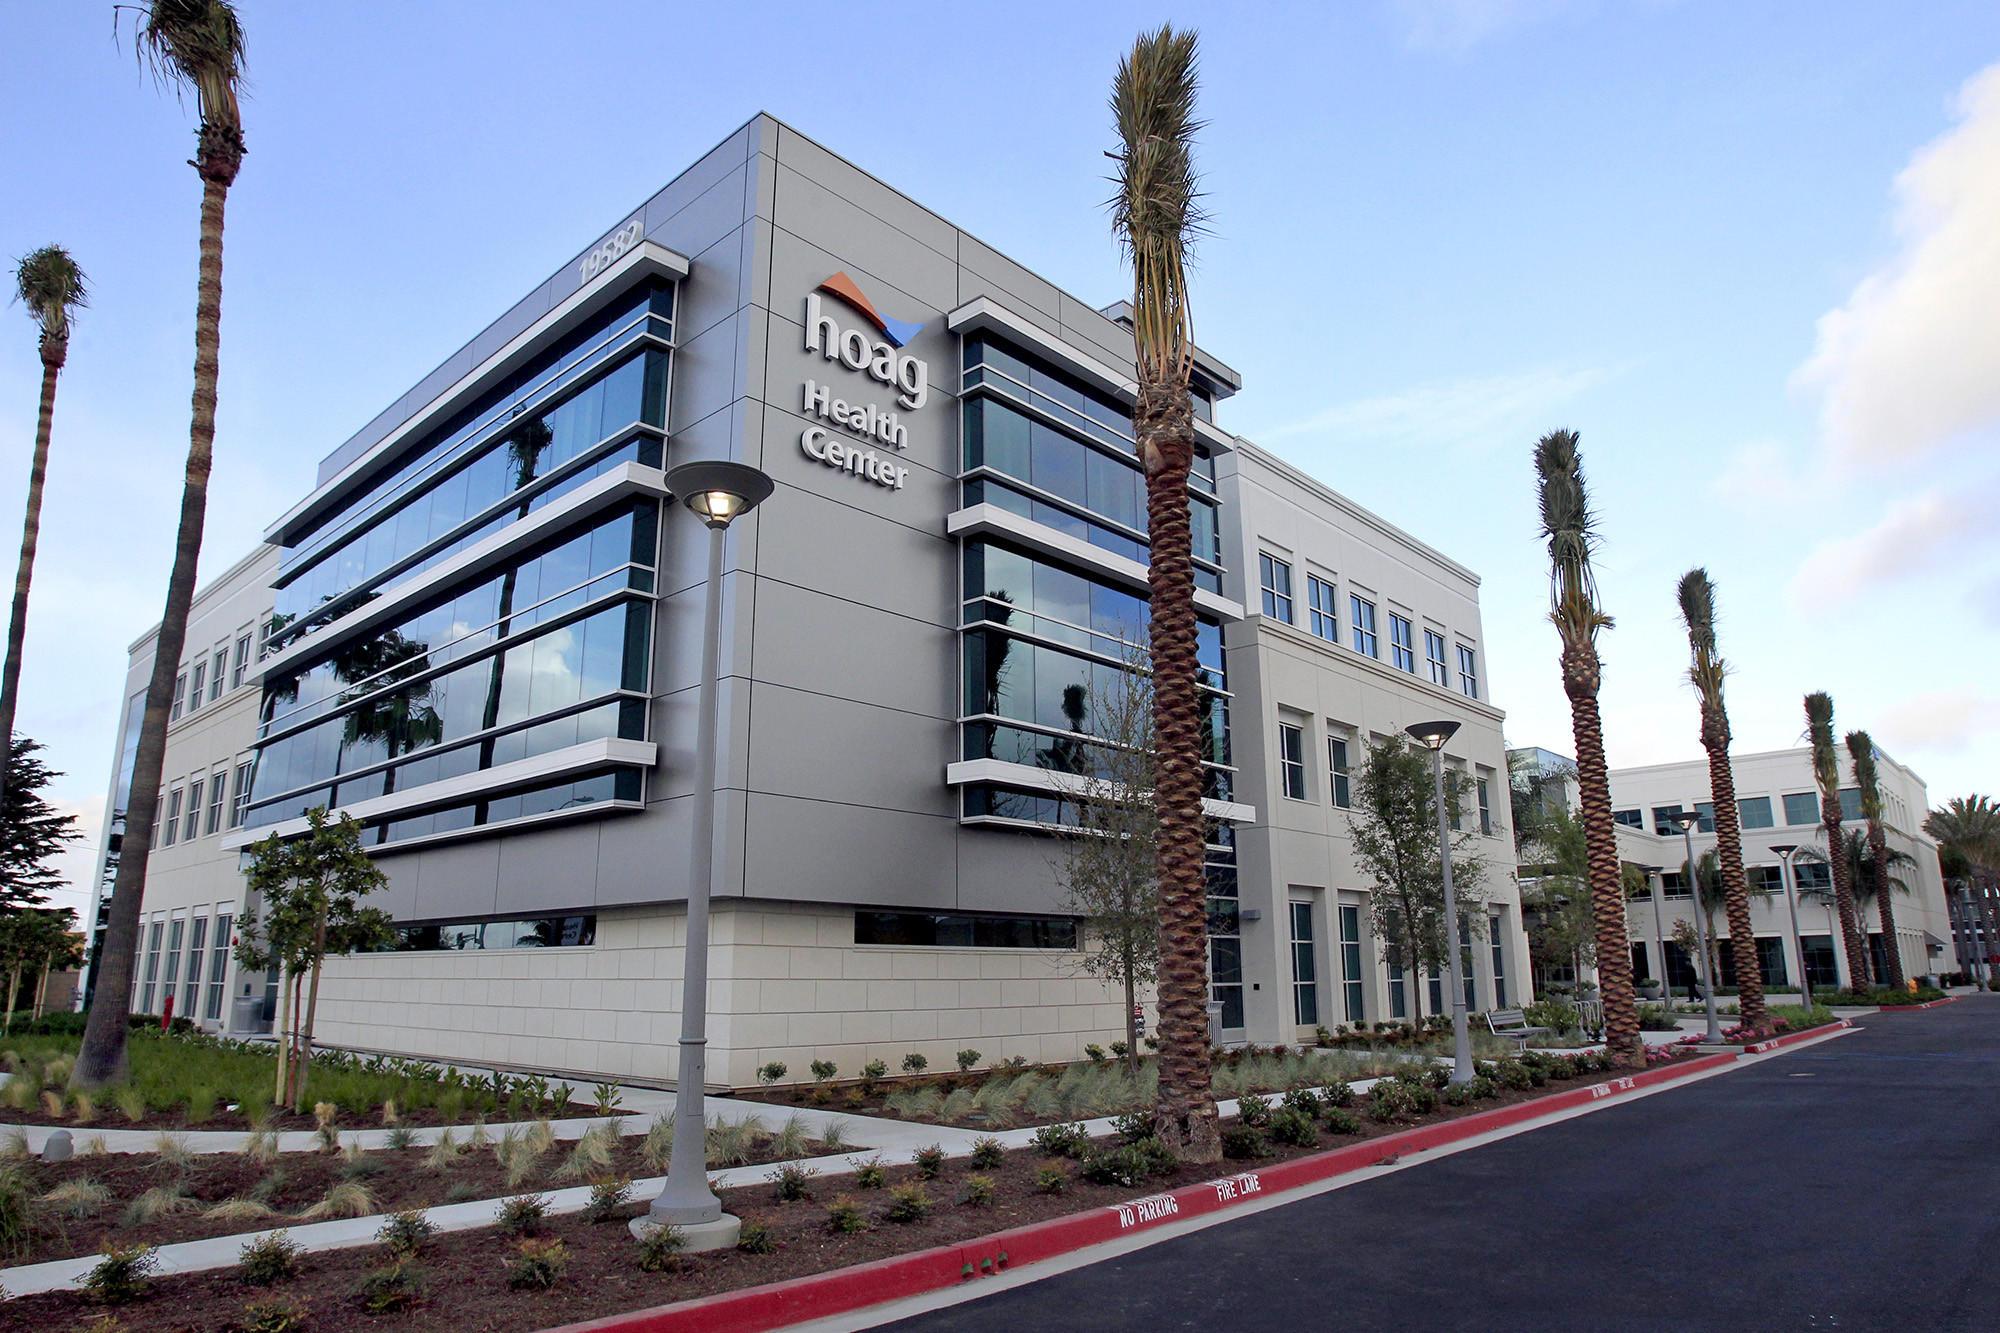 Hoag Health Center in Huntington Beach is at 19582 Beach Blvd.